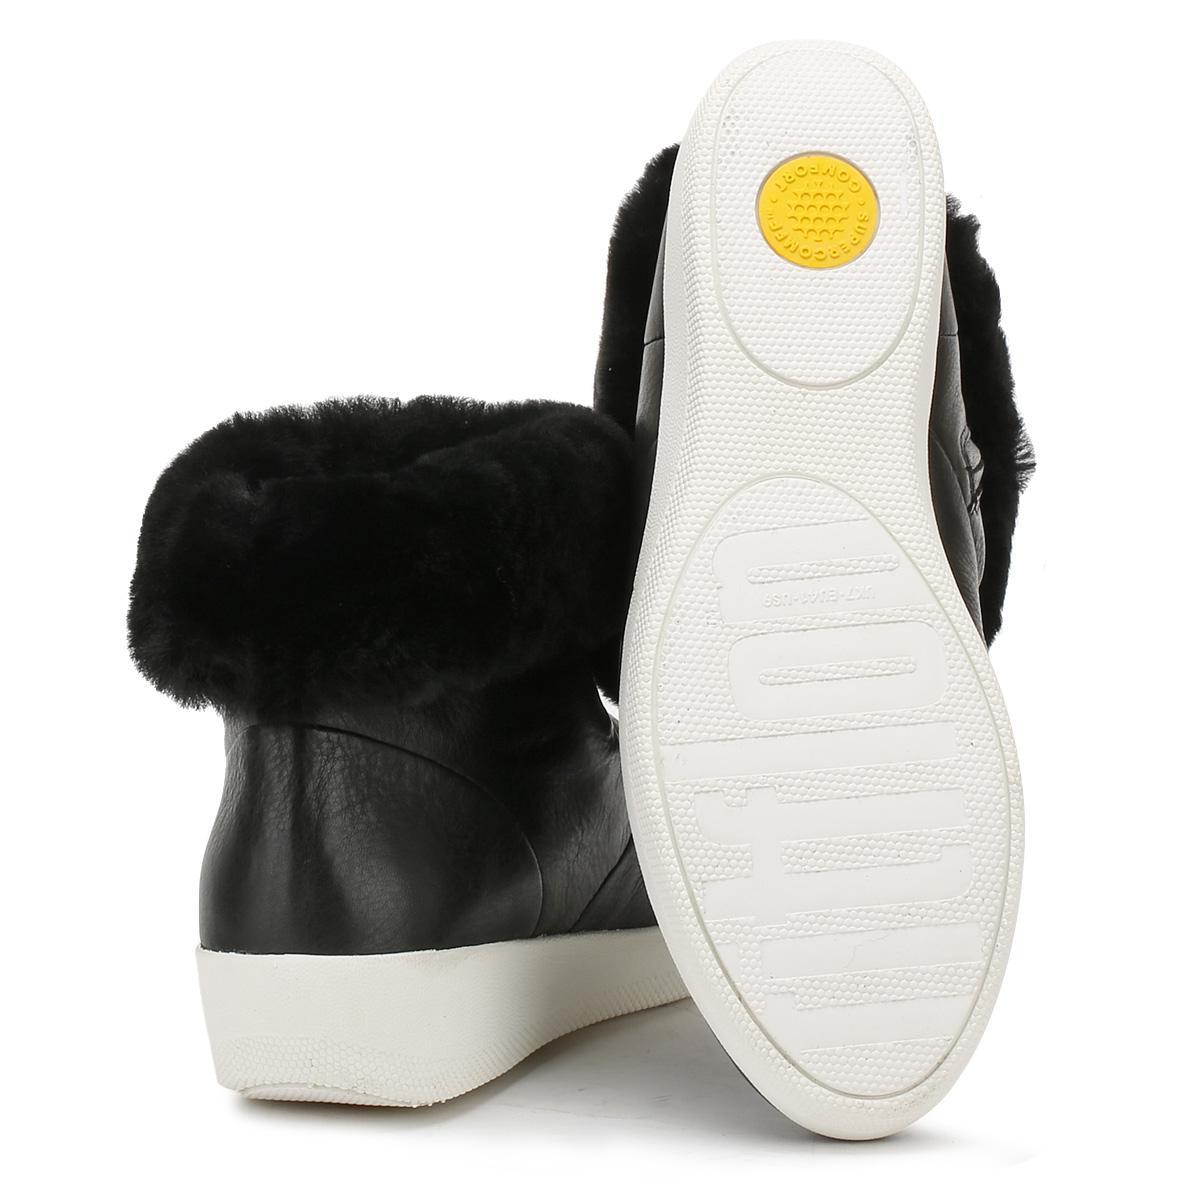 f0b65d022b62 FitFlop Skatebootie - Black Leather Womens BOOTS 6 UK